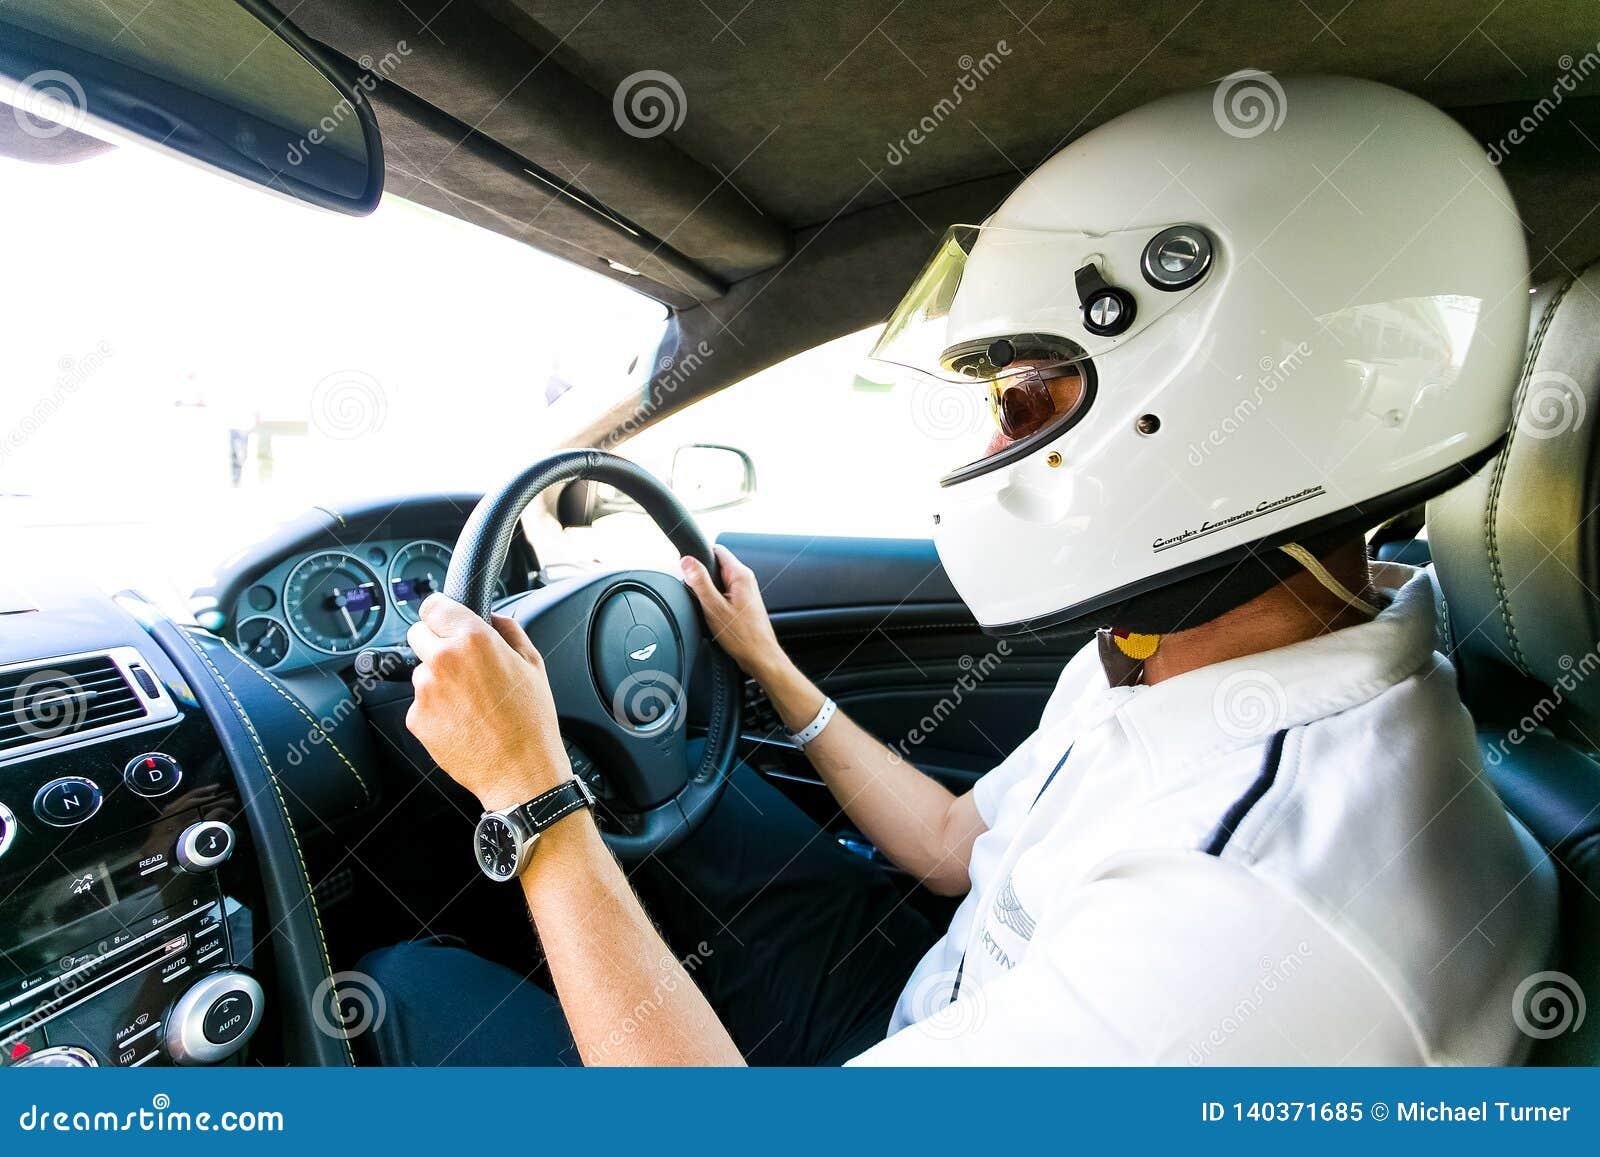 Race Car Driver In An Aston Martin Sports Car Editorial Image Image Of Motor Racing 140371685